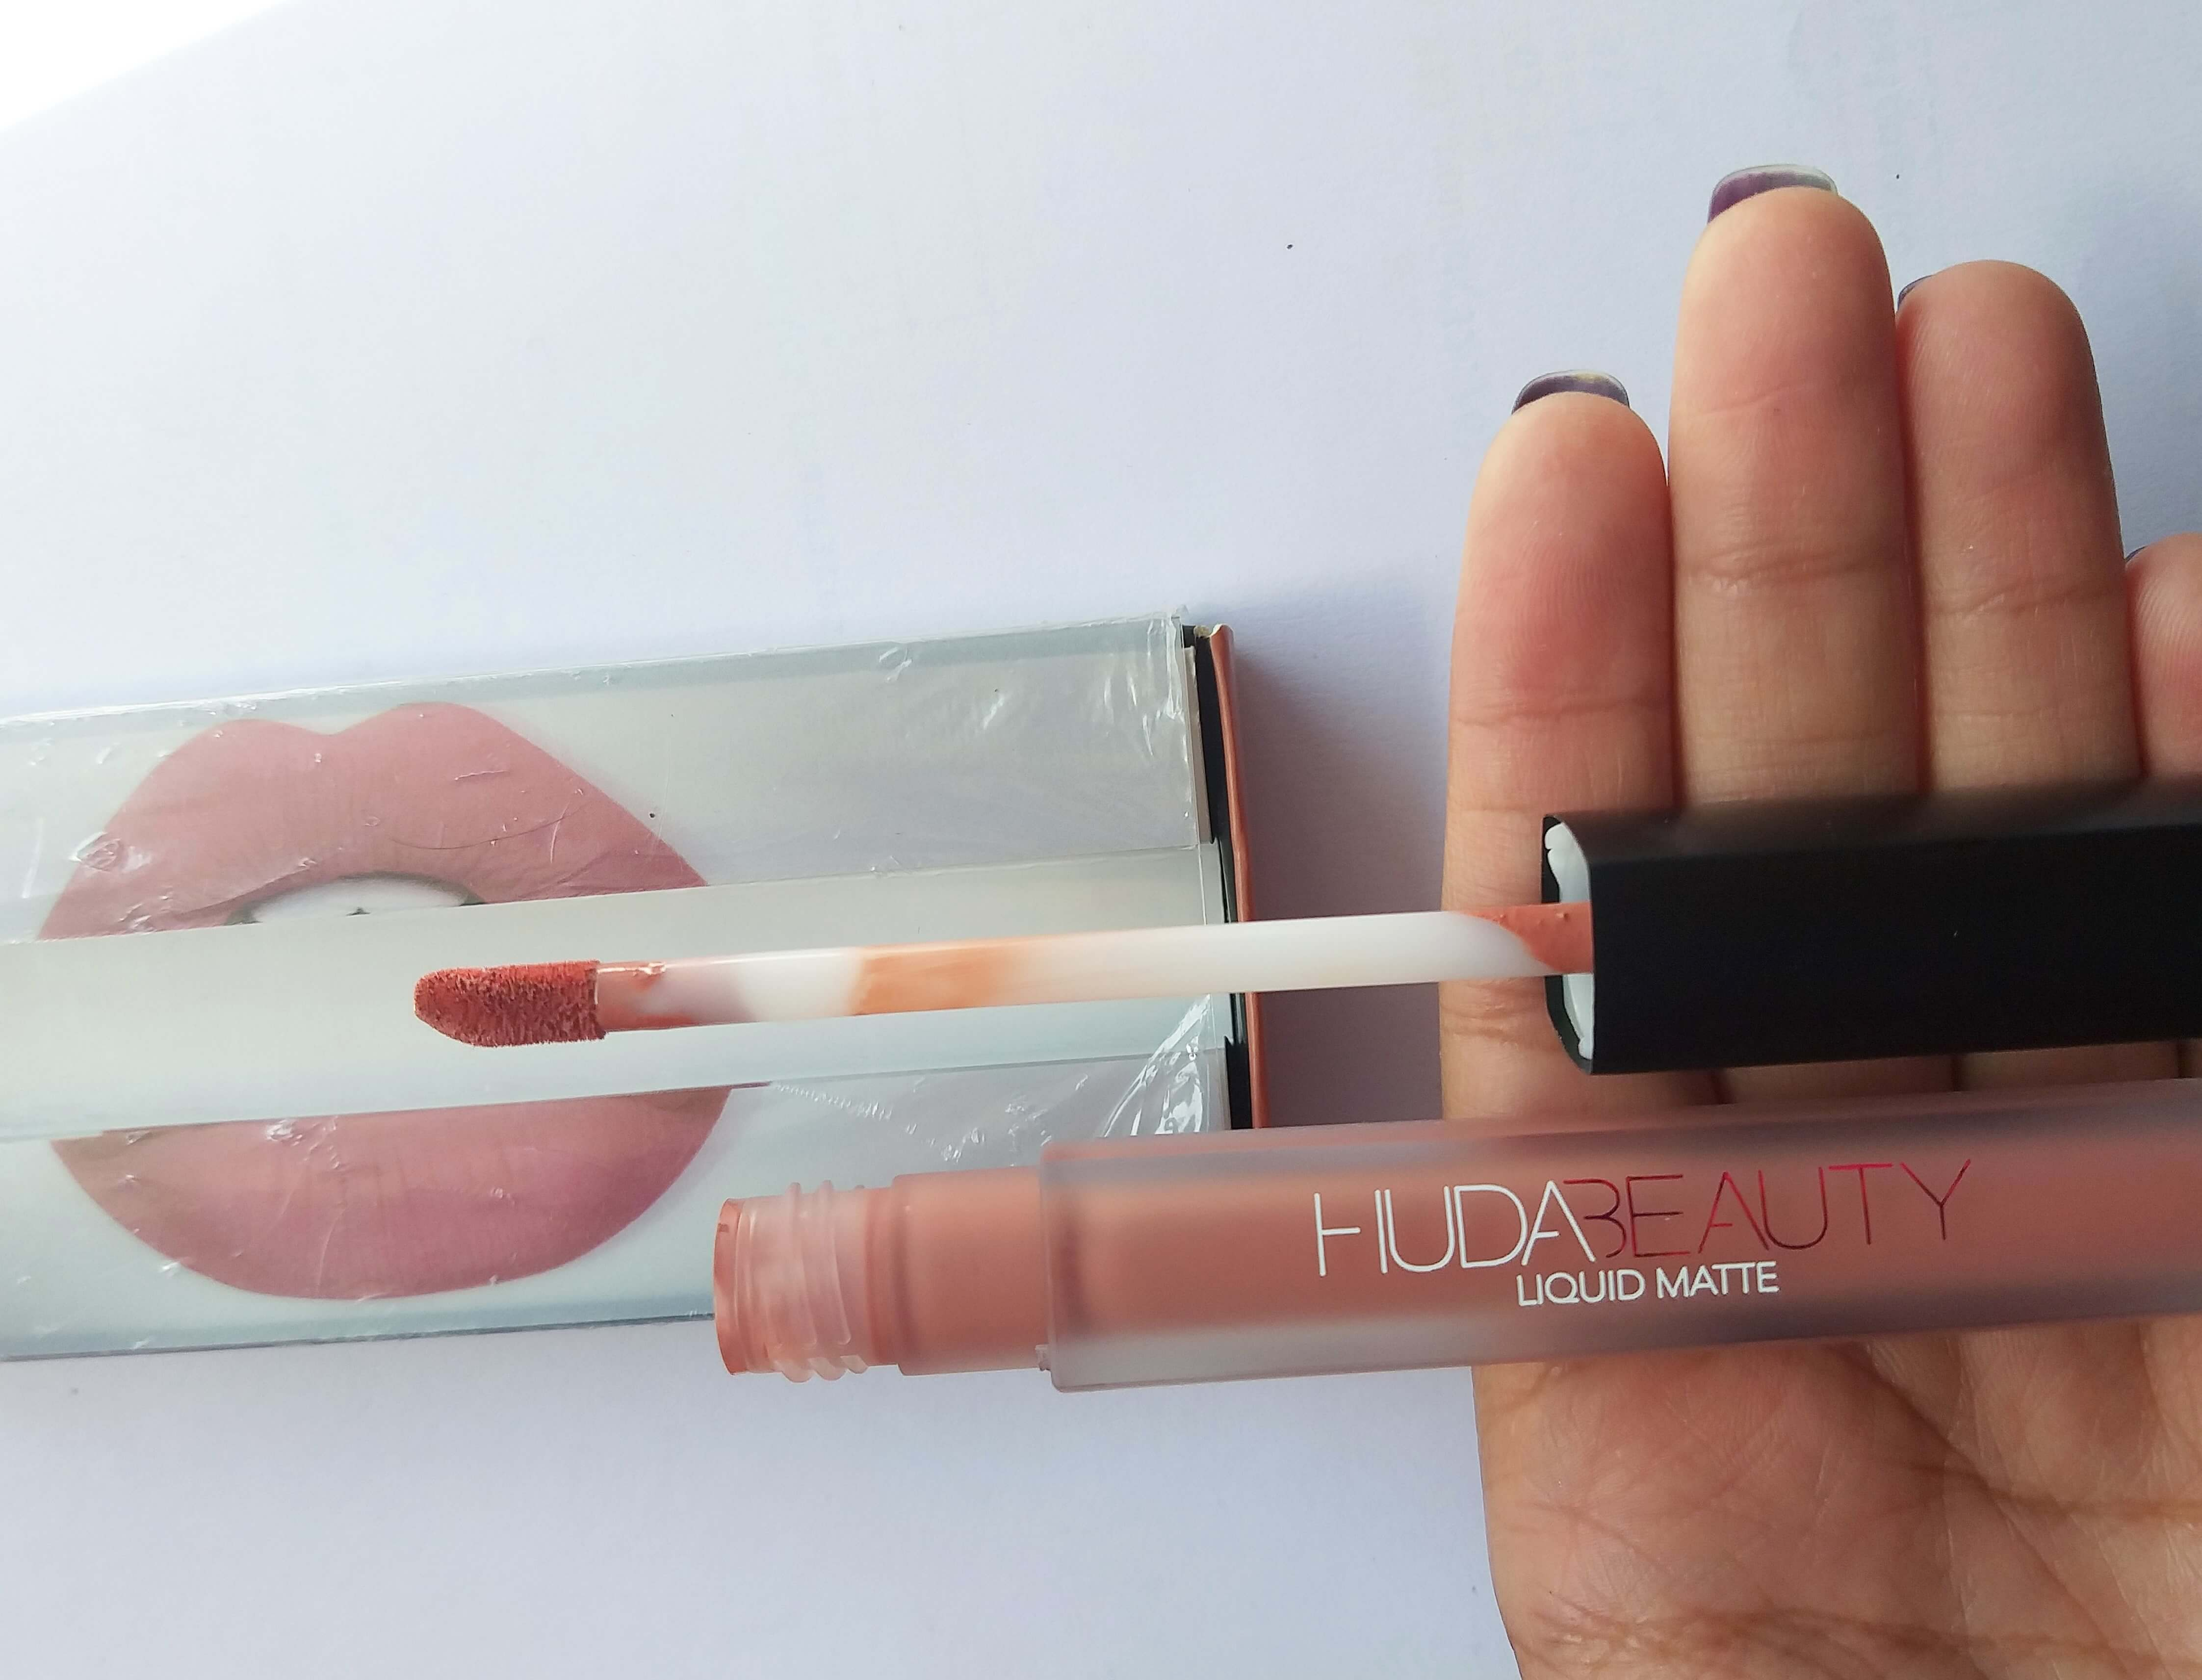 Huda Beauty Liquid Matte Lipstick Bombshell